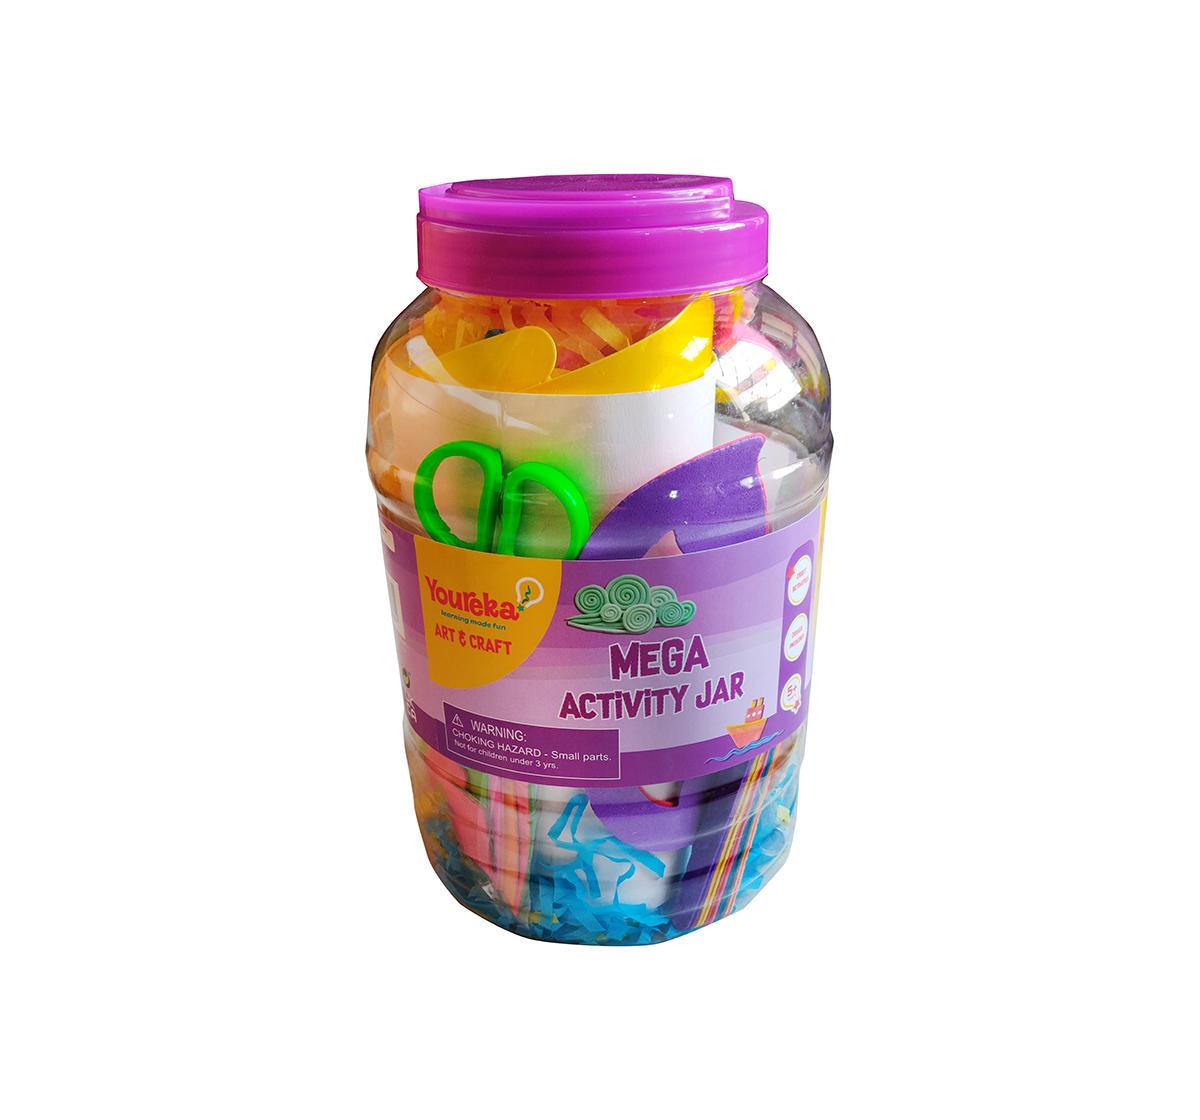 Youreka | Youreka Mega Activity Jar DIY Art & Craft Kits for Girls age 3Y+